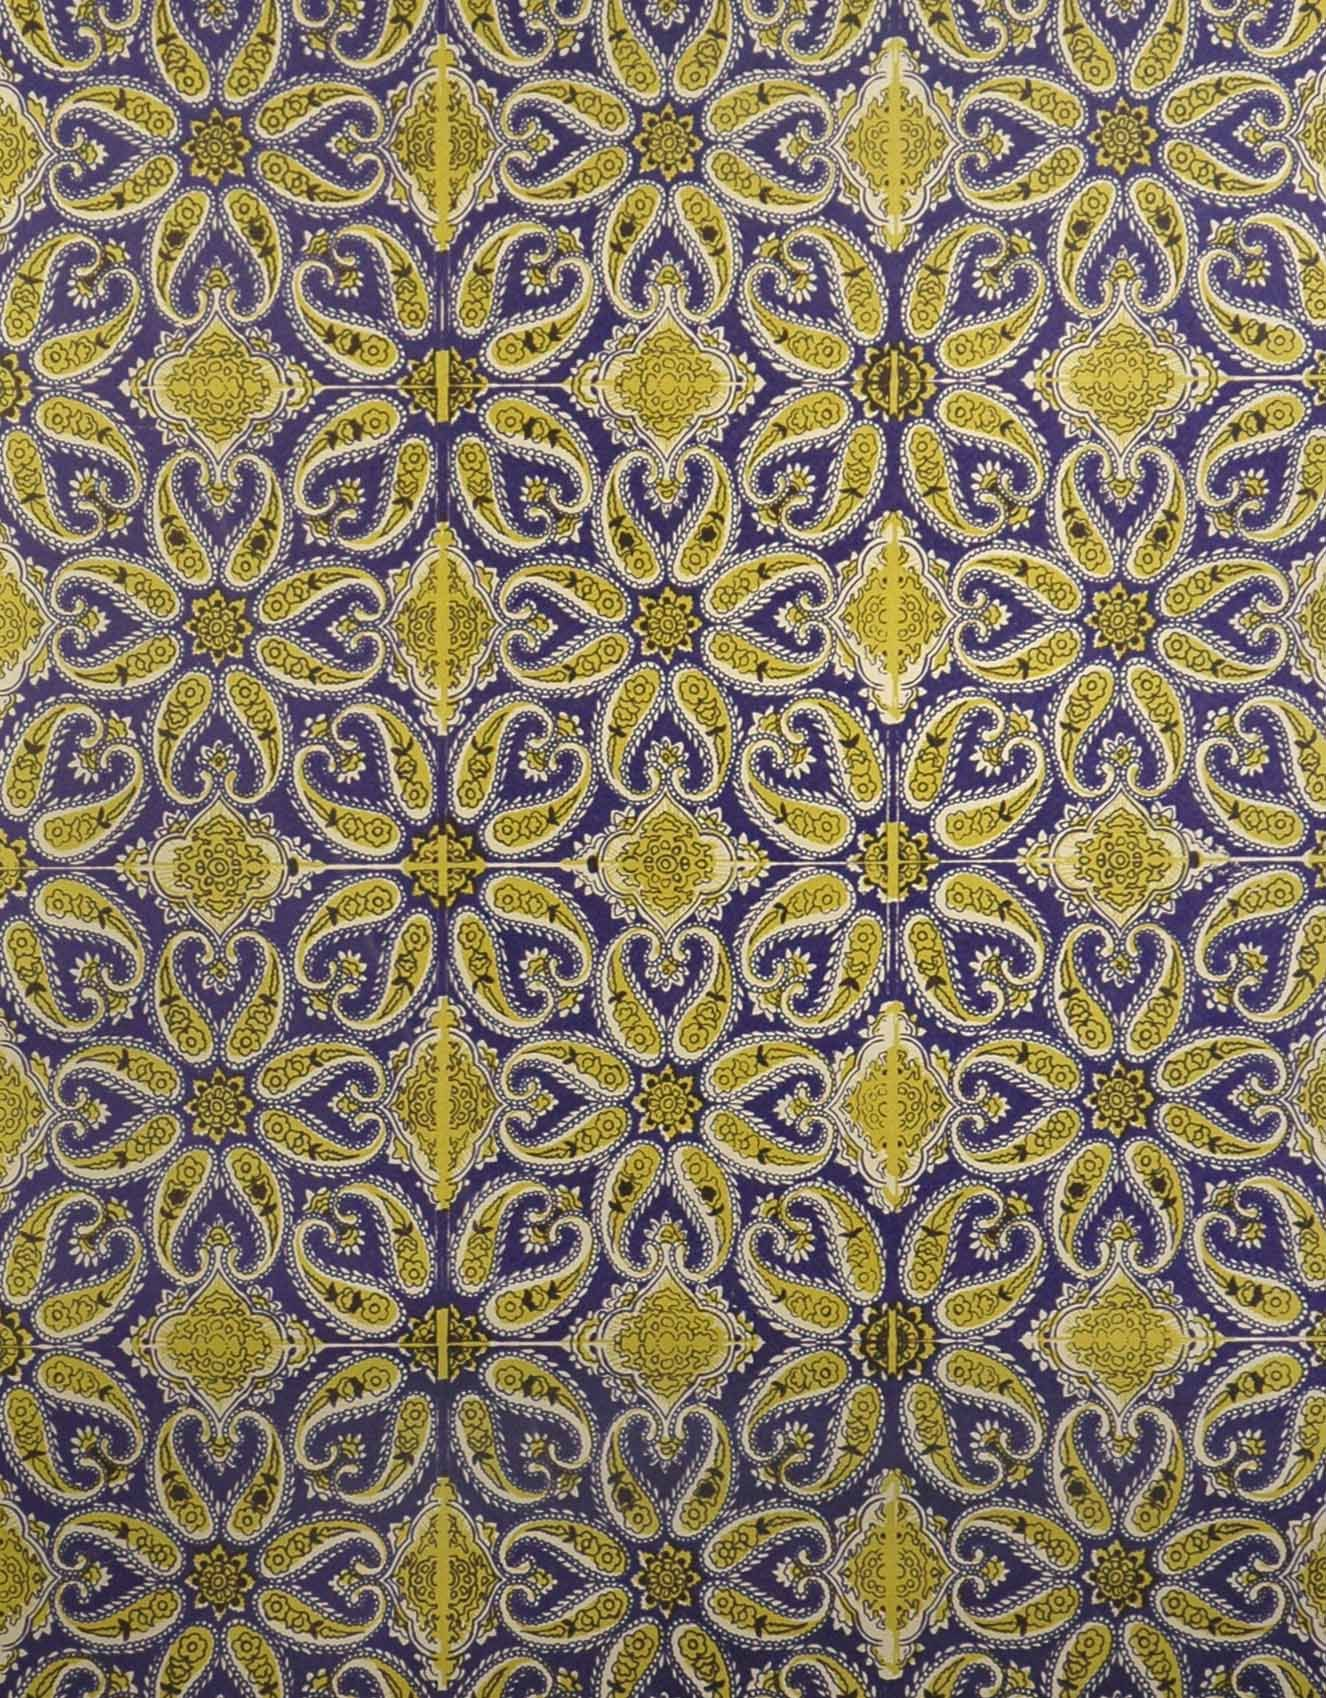 Tapeten Historische Tapeten Hembus Gmbh Ca 1880